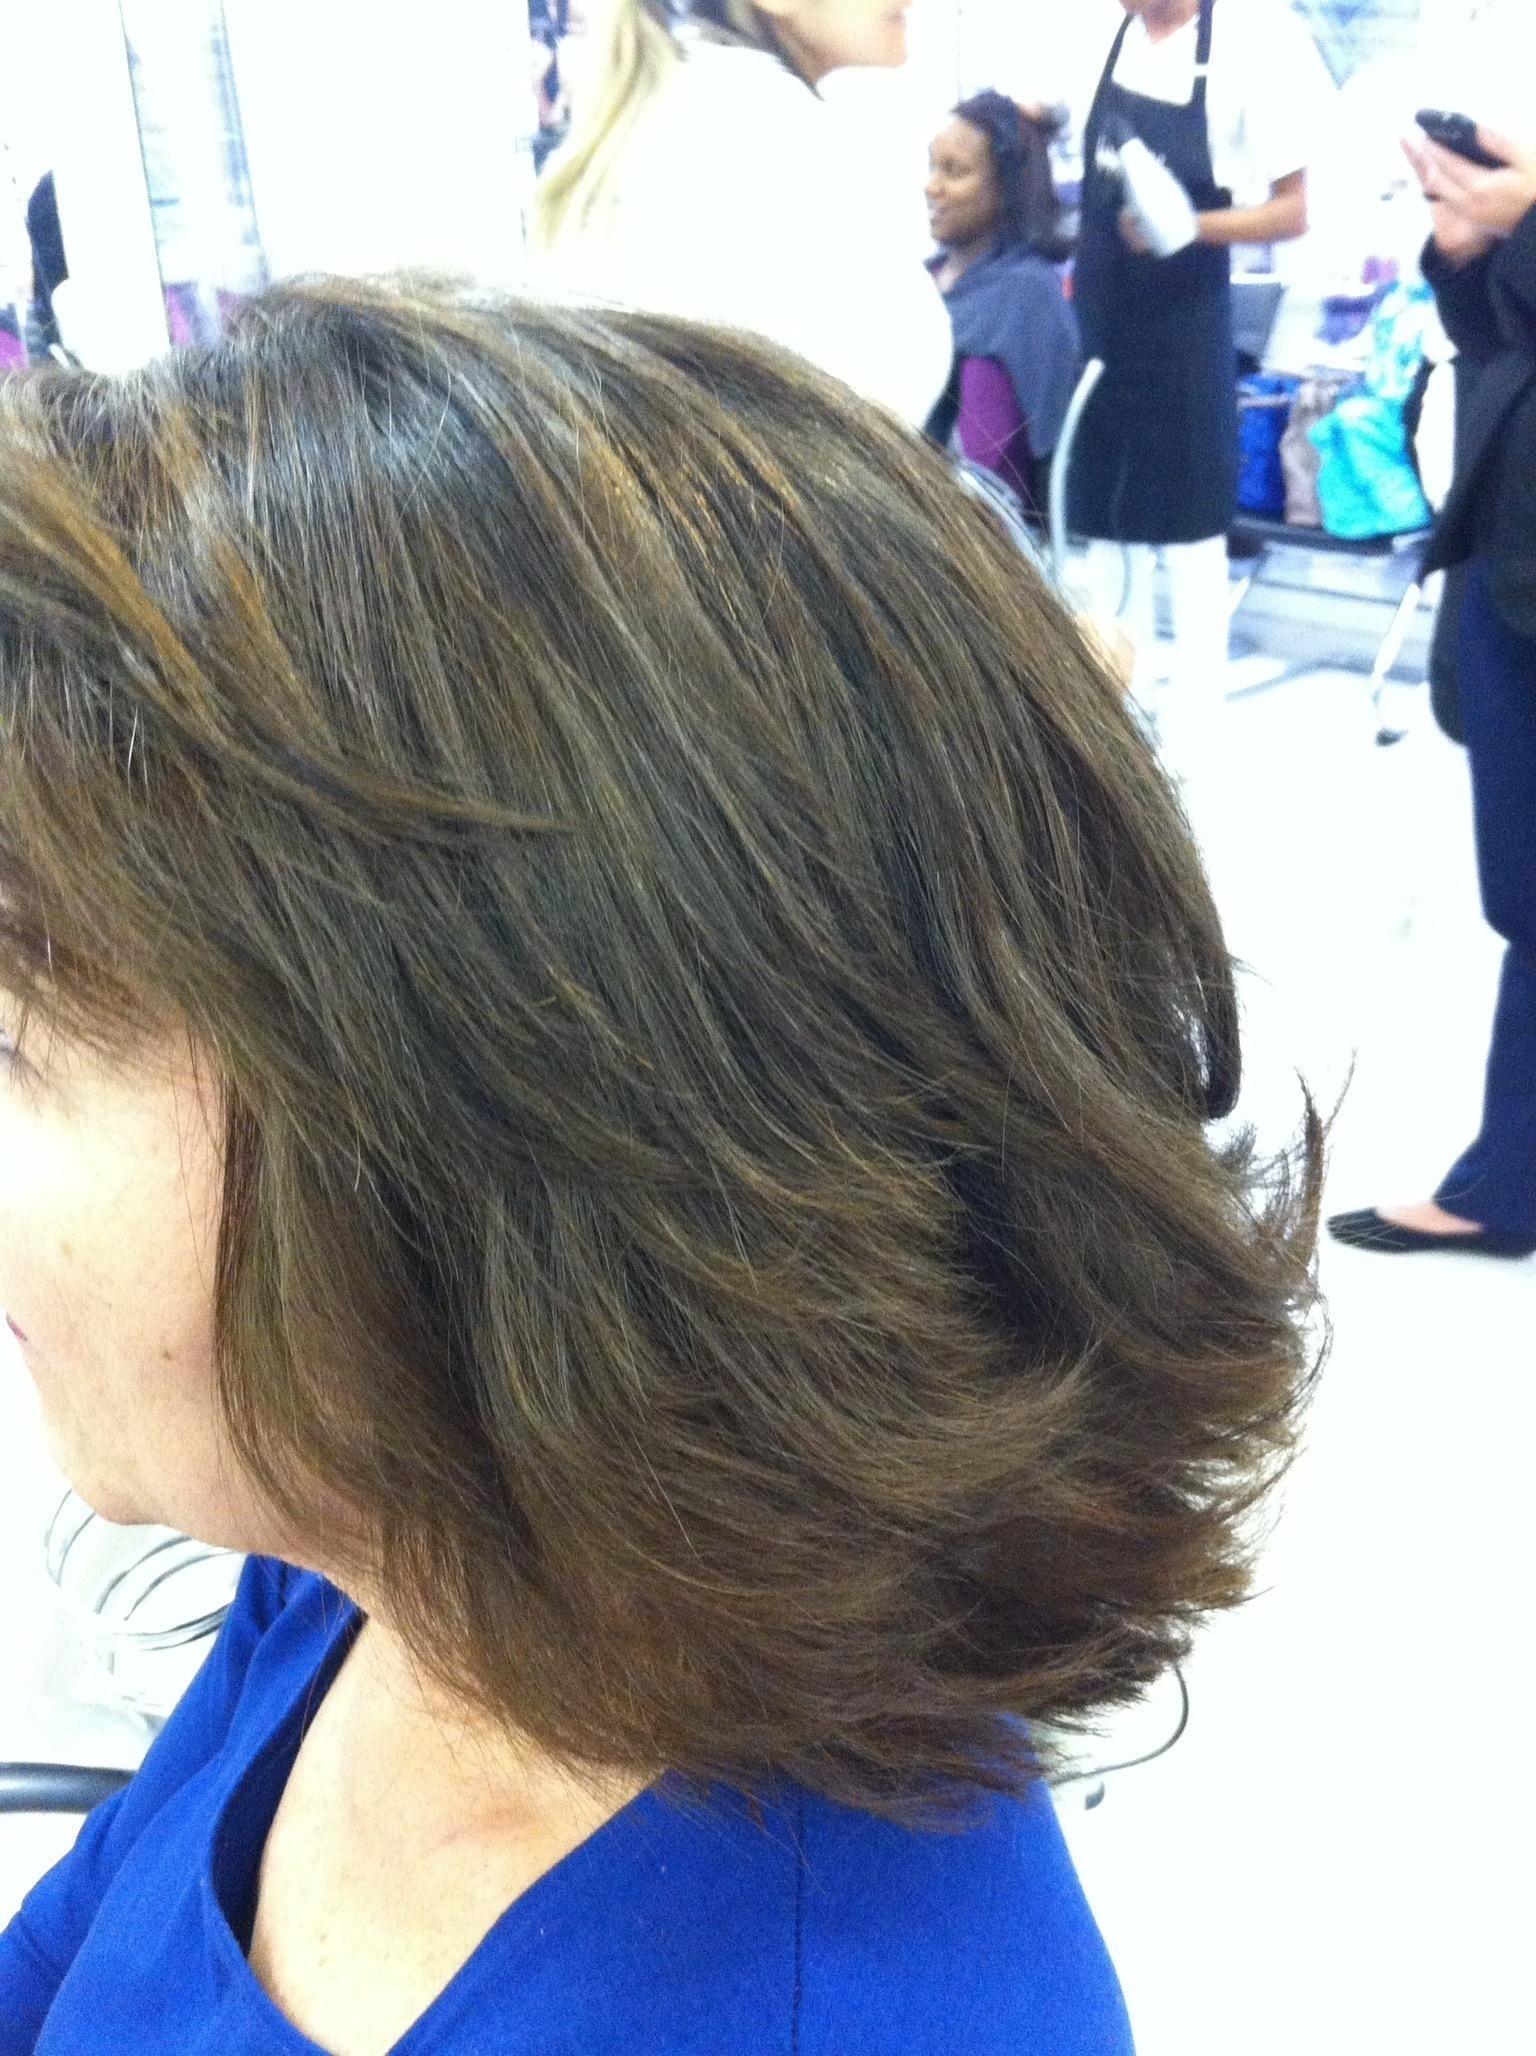 COLORACAO E CORTE cabeleireiro(a) maquiador(a)